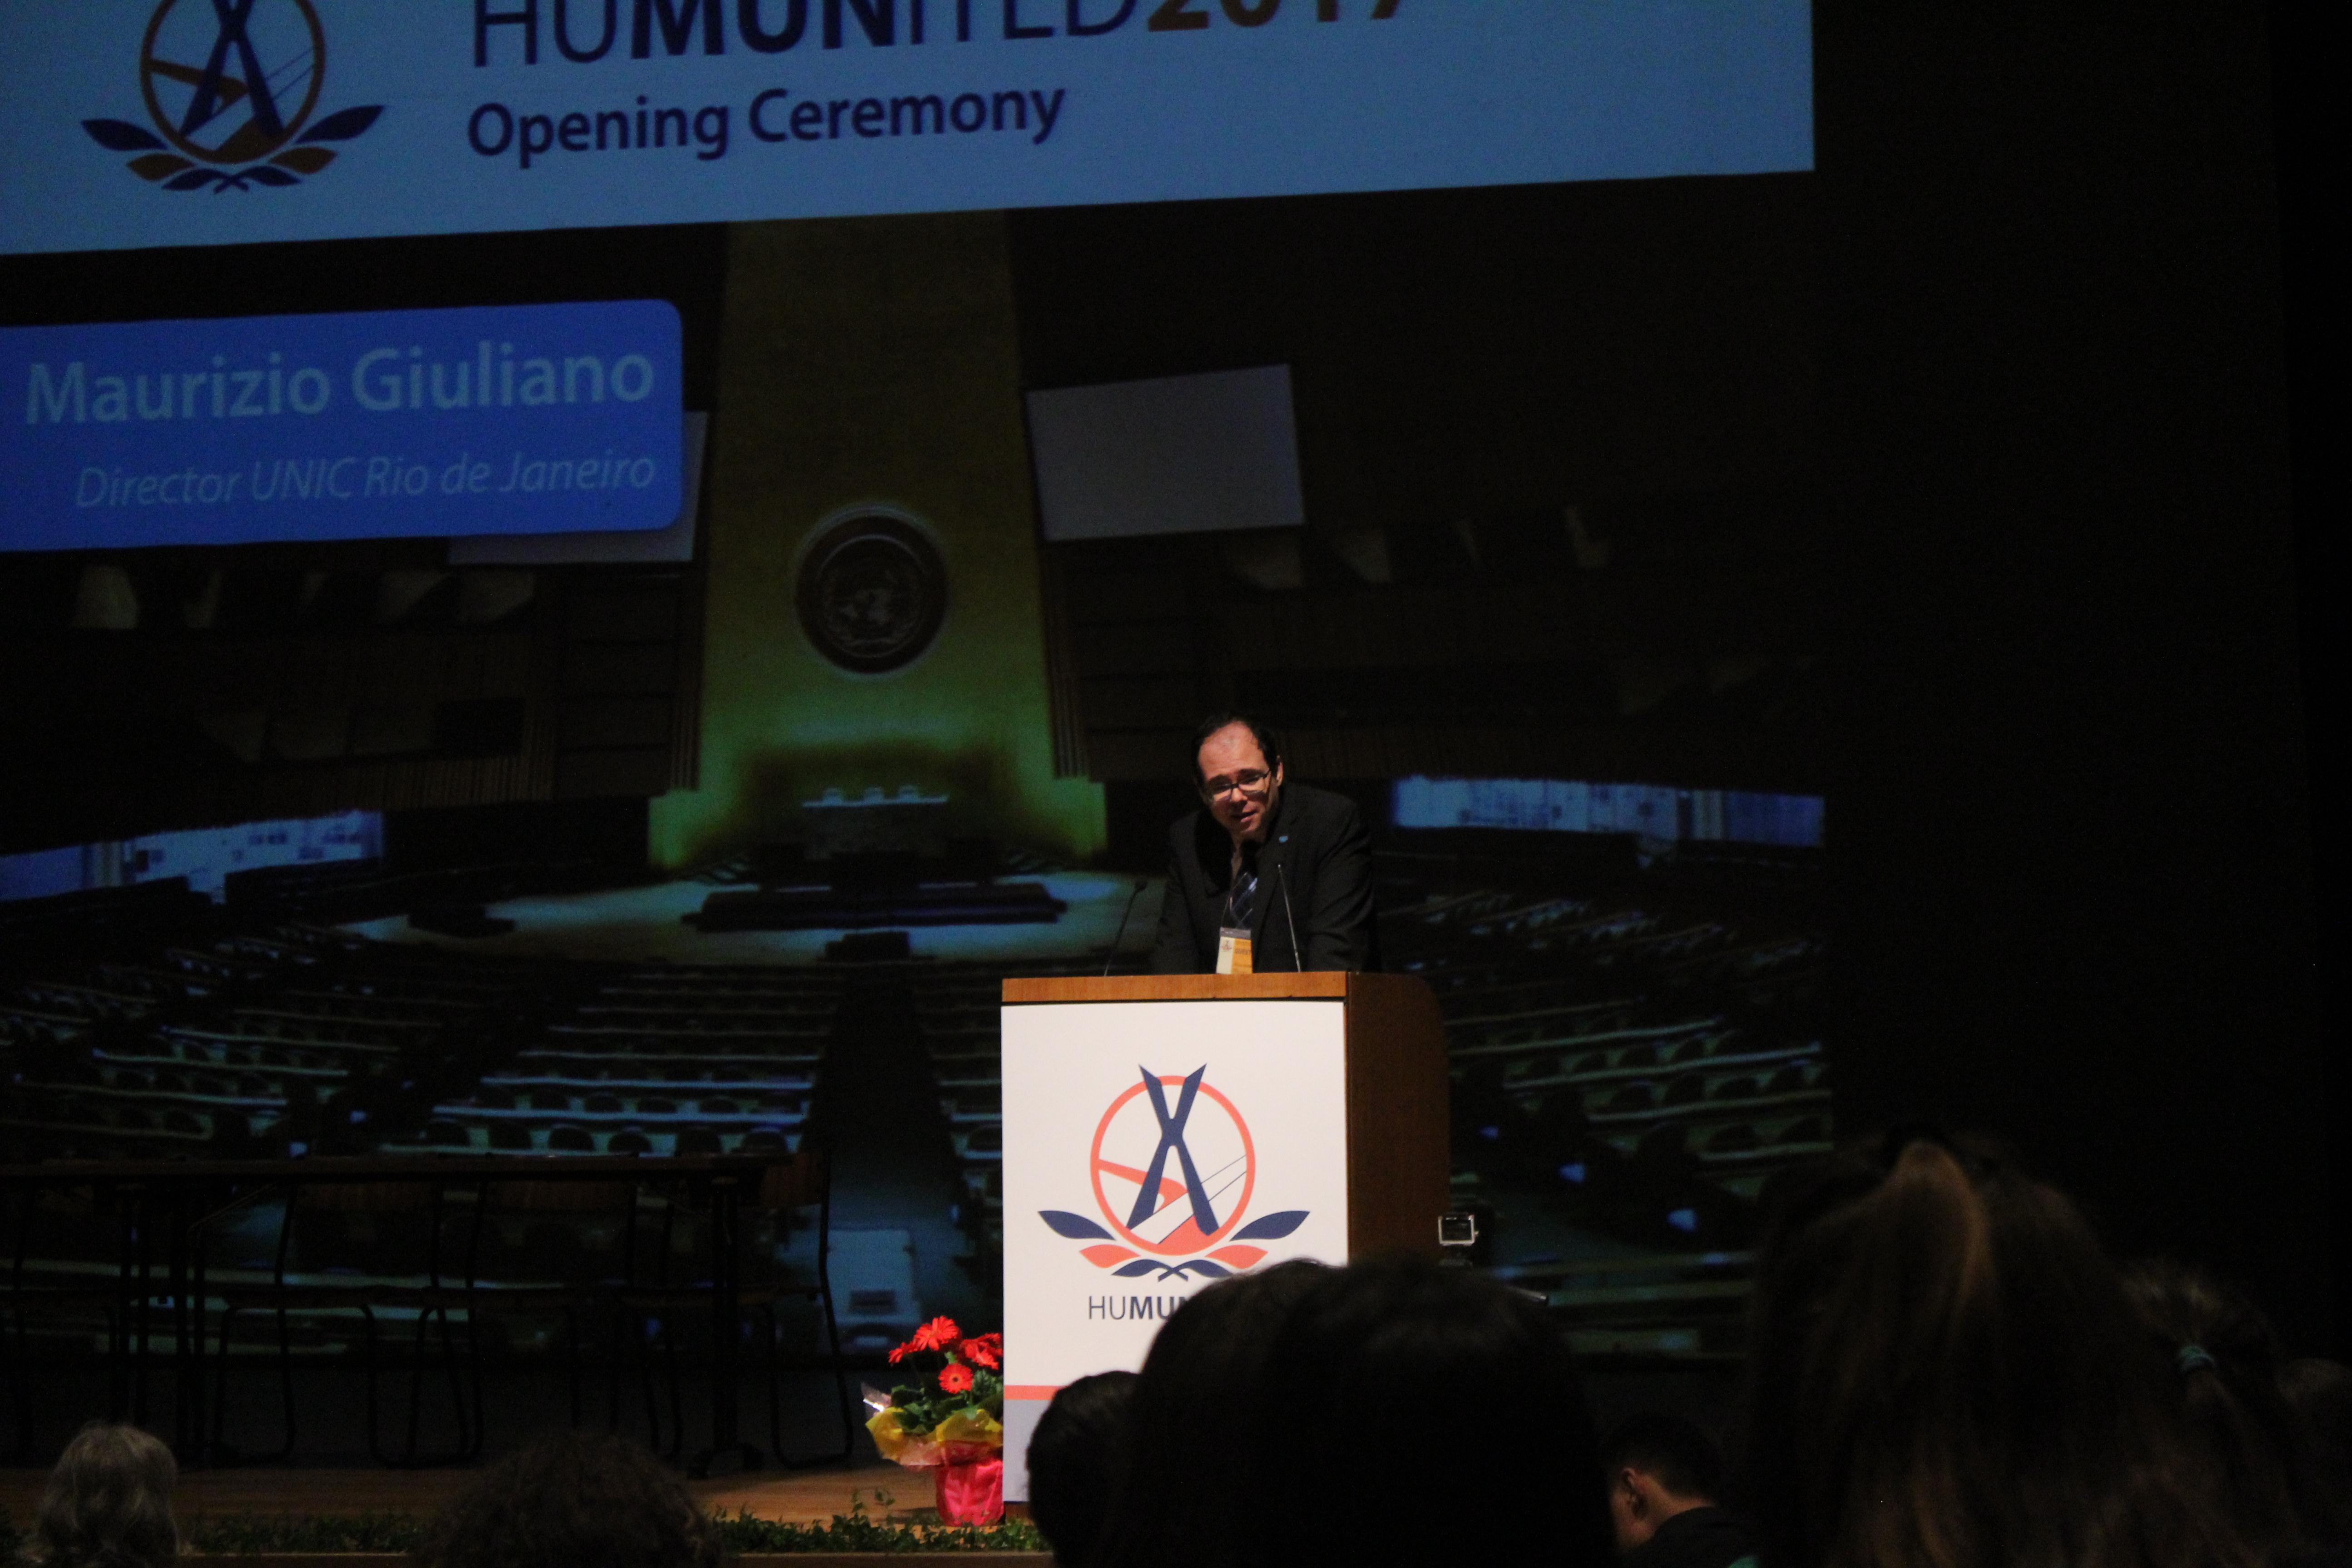 Maurizio Giuliano's Speech